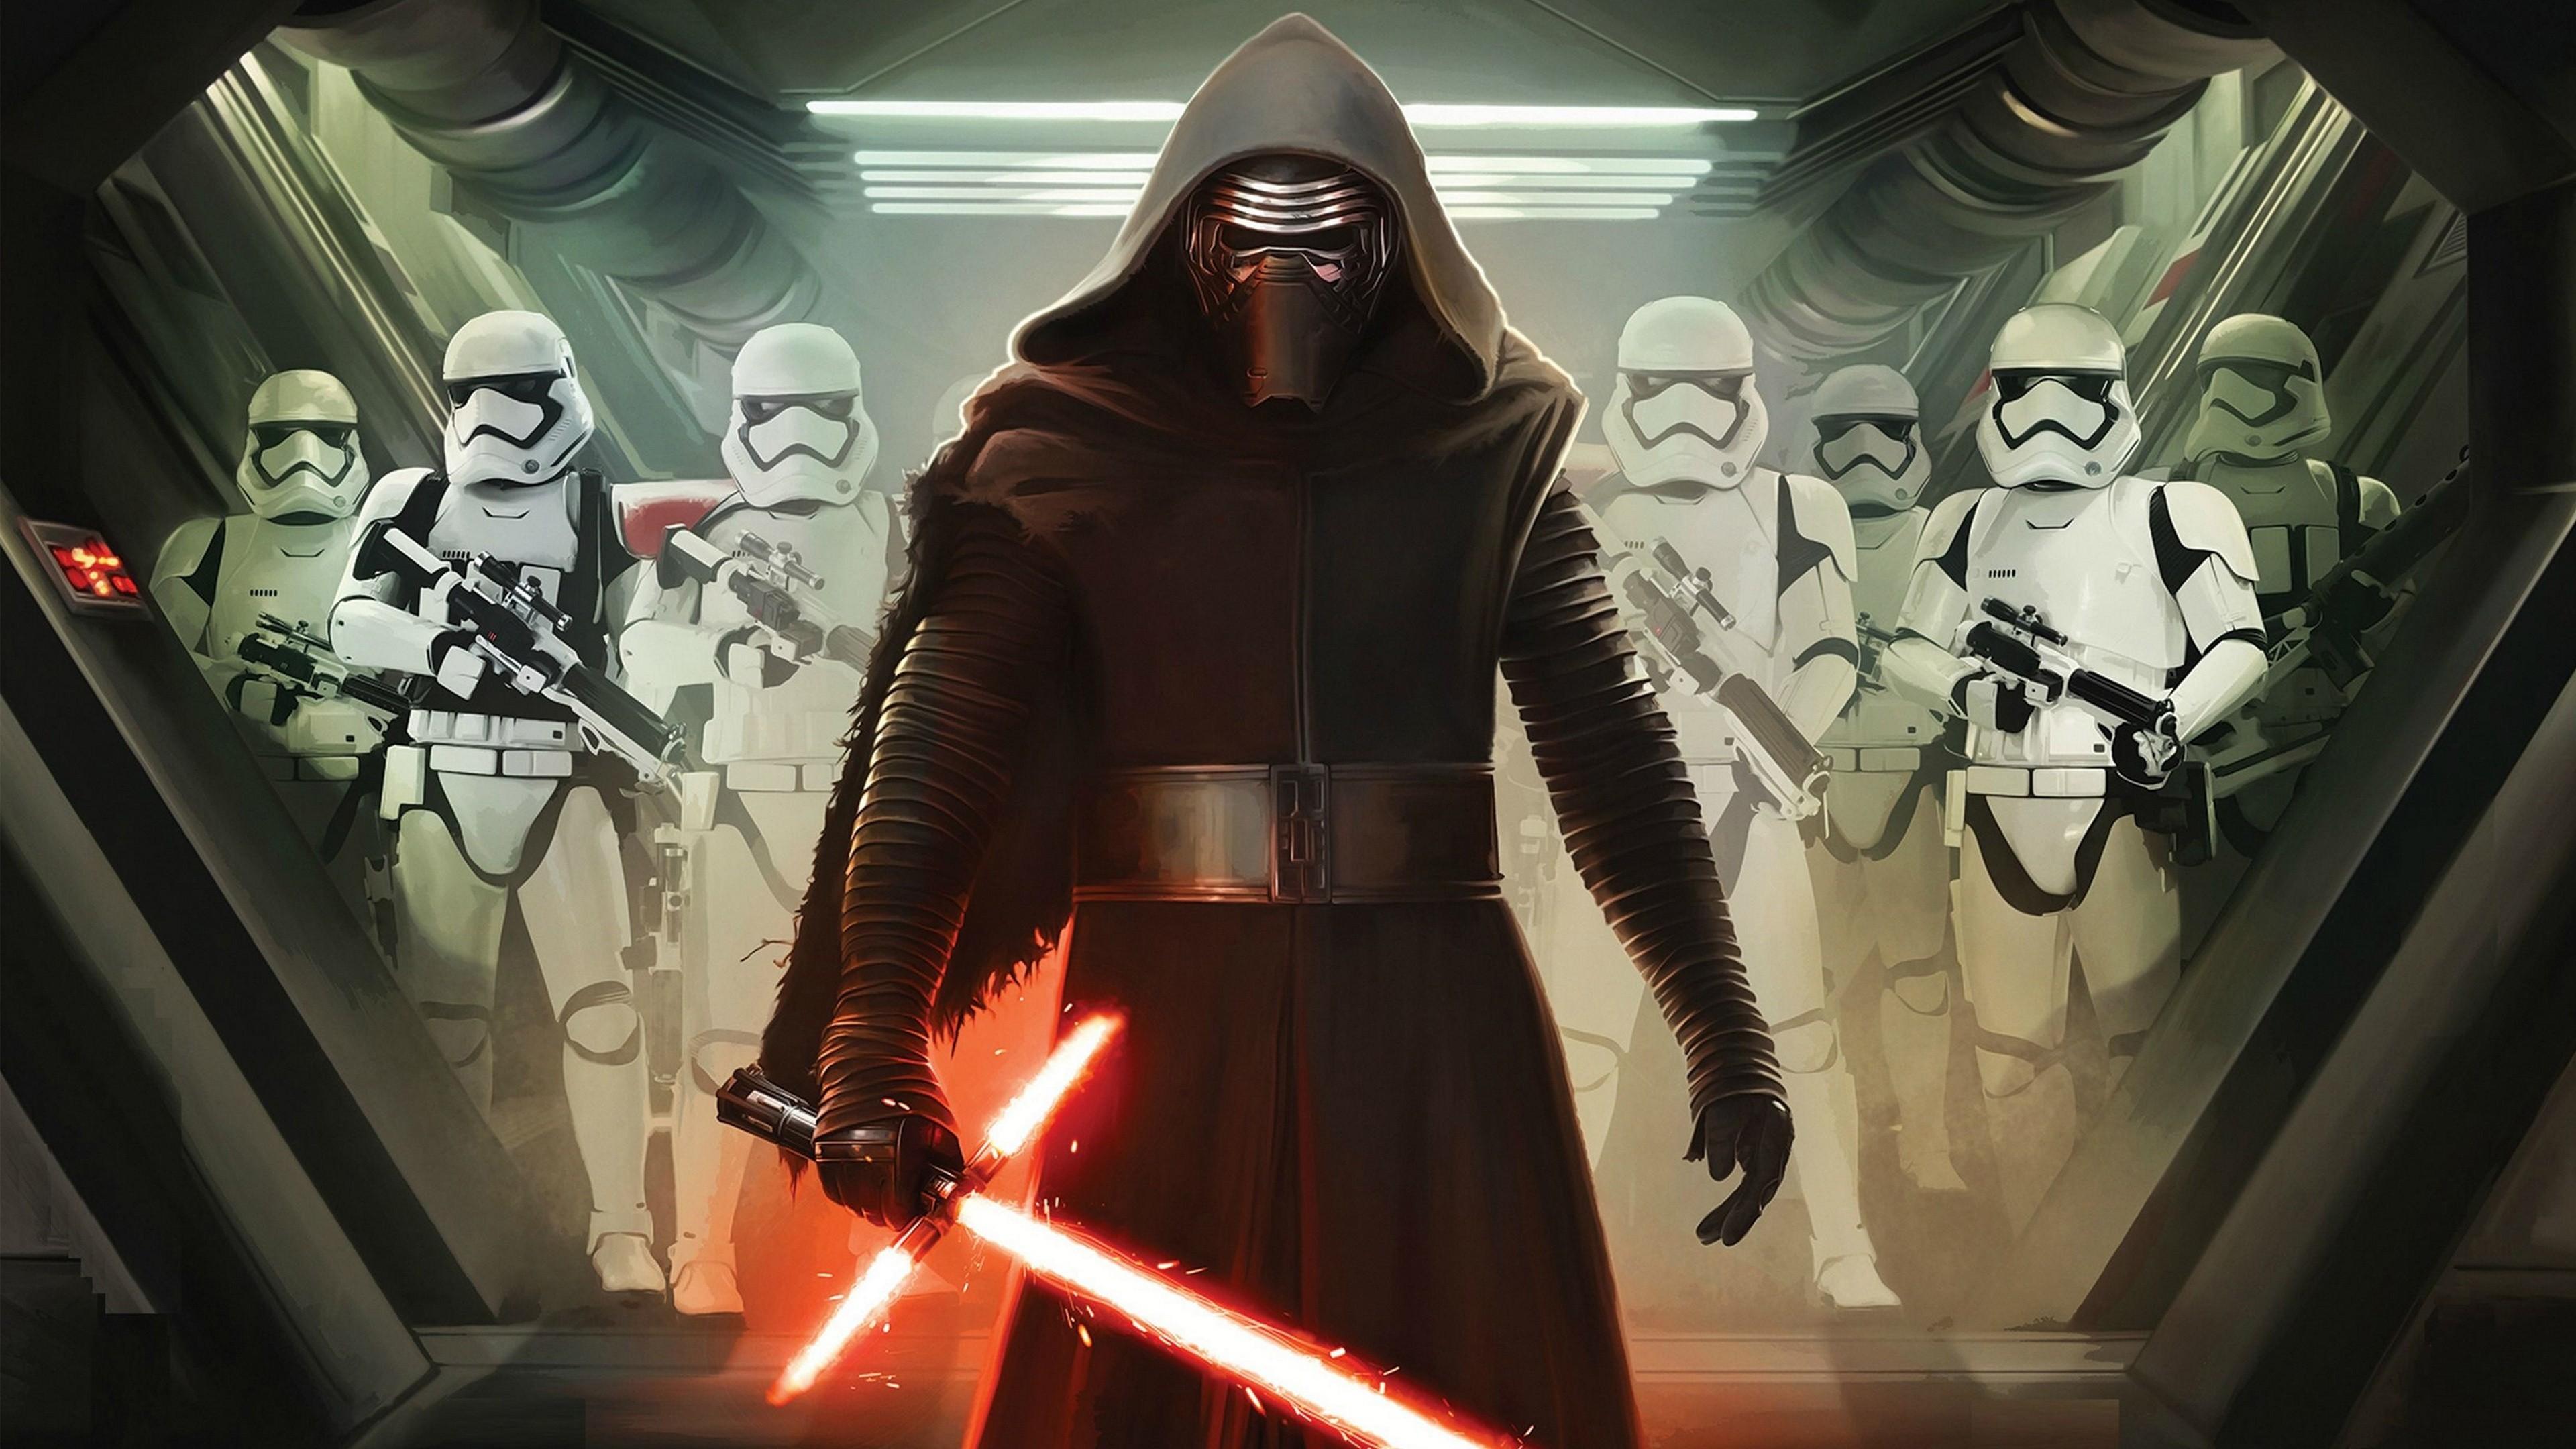 Star Wars Episode VII: The Force Awakens – Kylo Ren & Stormtroopers Poster